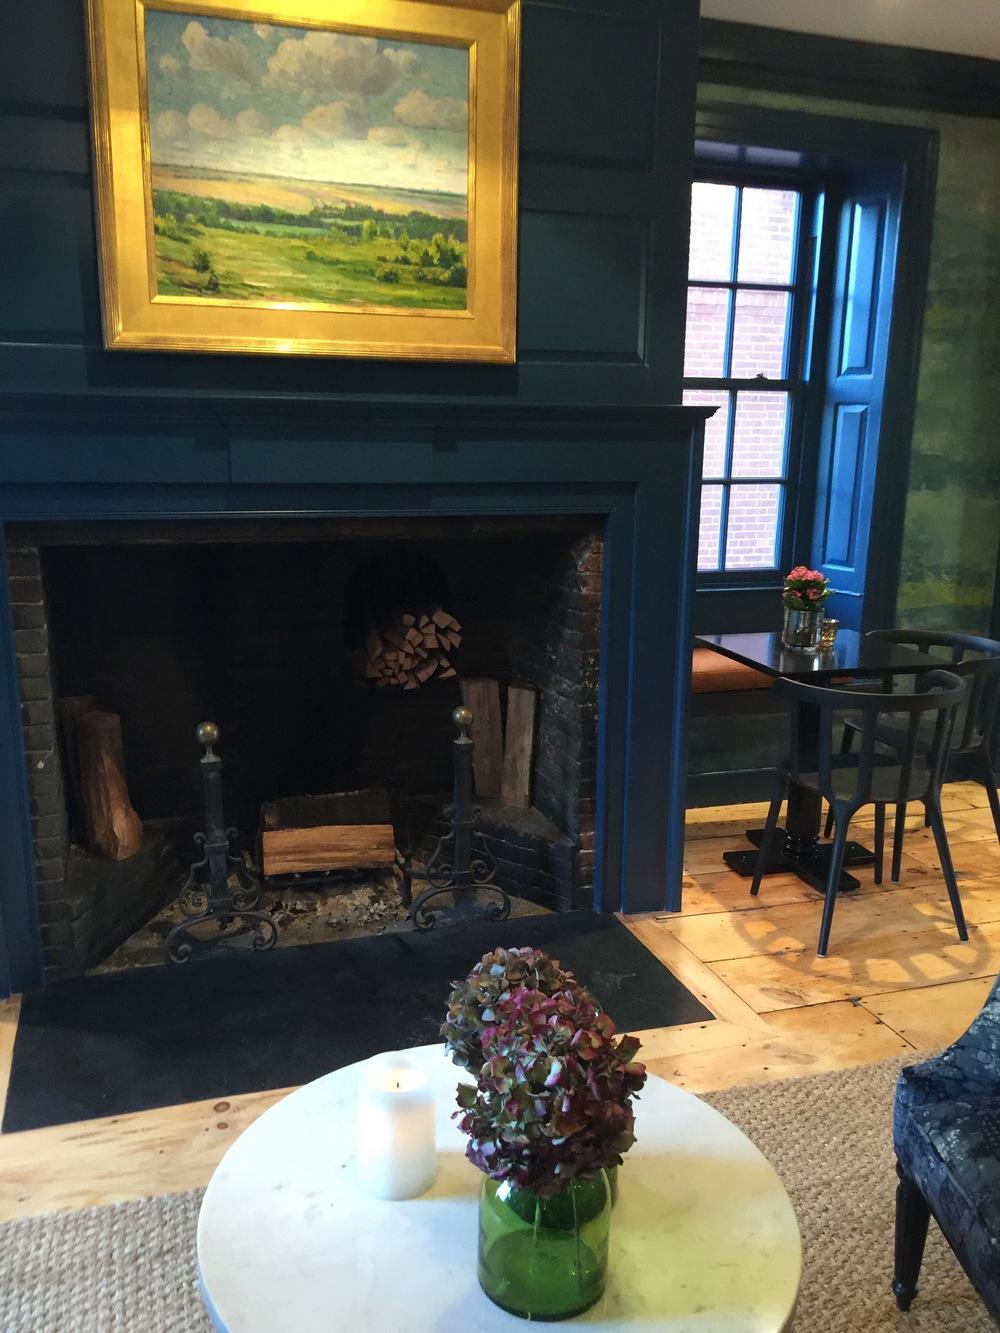 salem-massachusetts-travel-guide-what-to-do-the-merchant-lark-hotels-northshore-portsmouth-new-hampshire-blog-seacoast-lately.jpg21.jpg